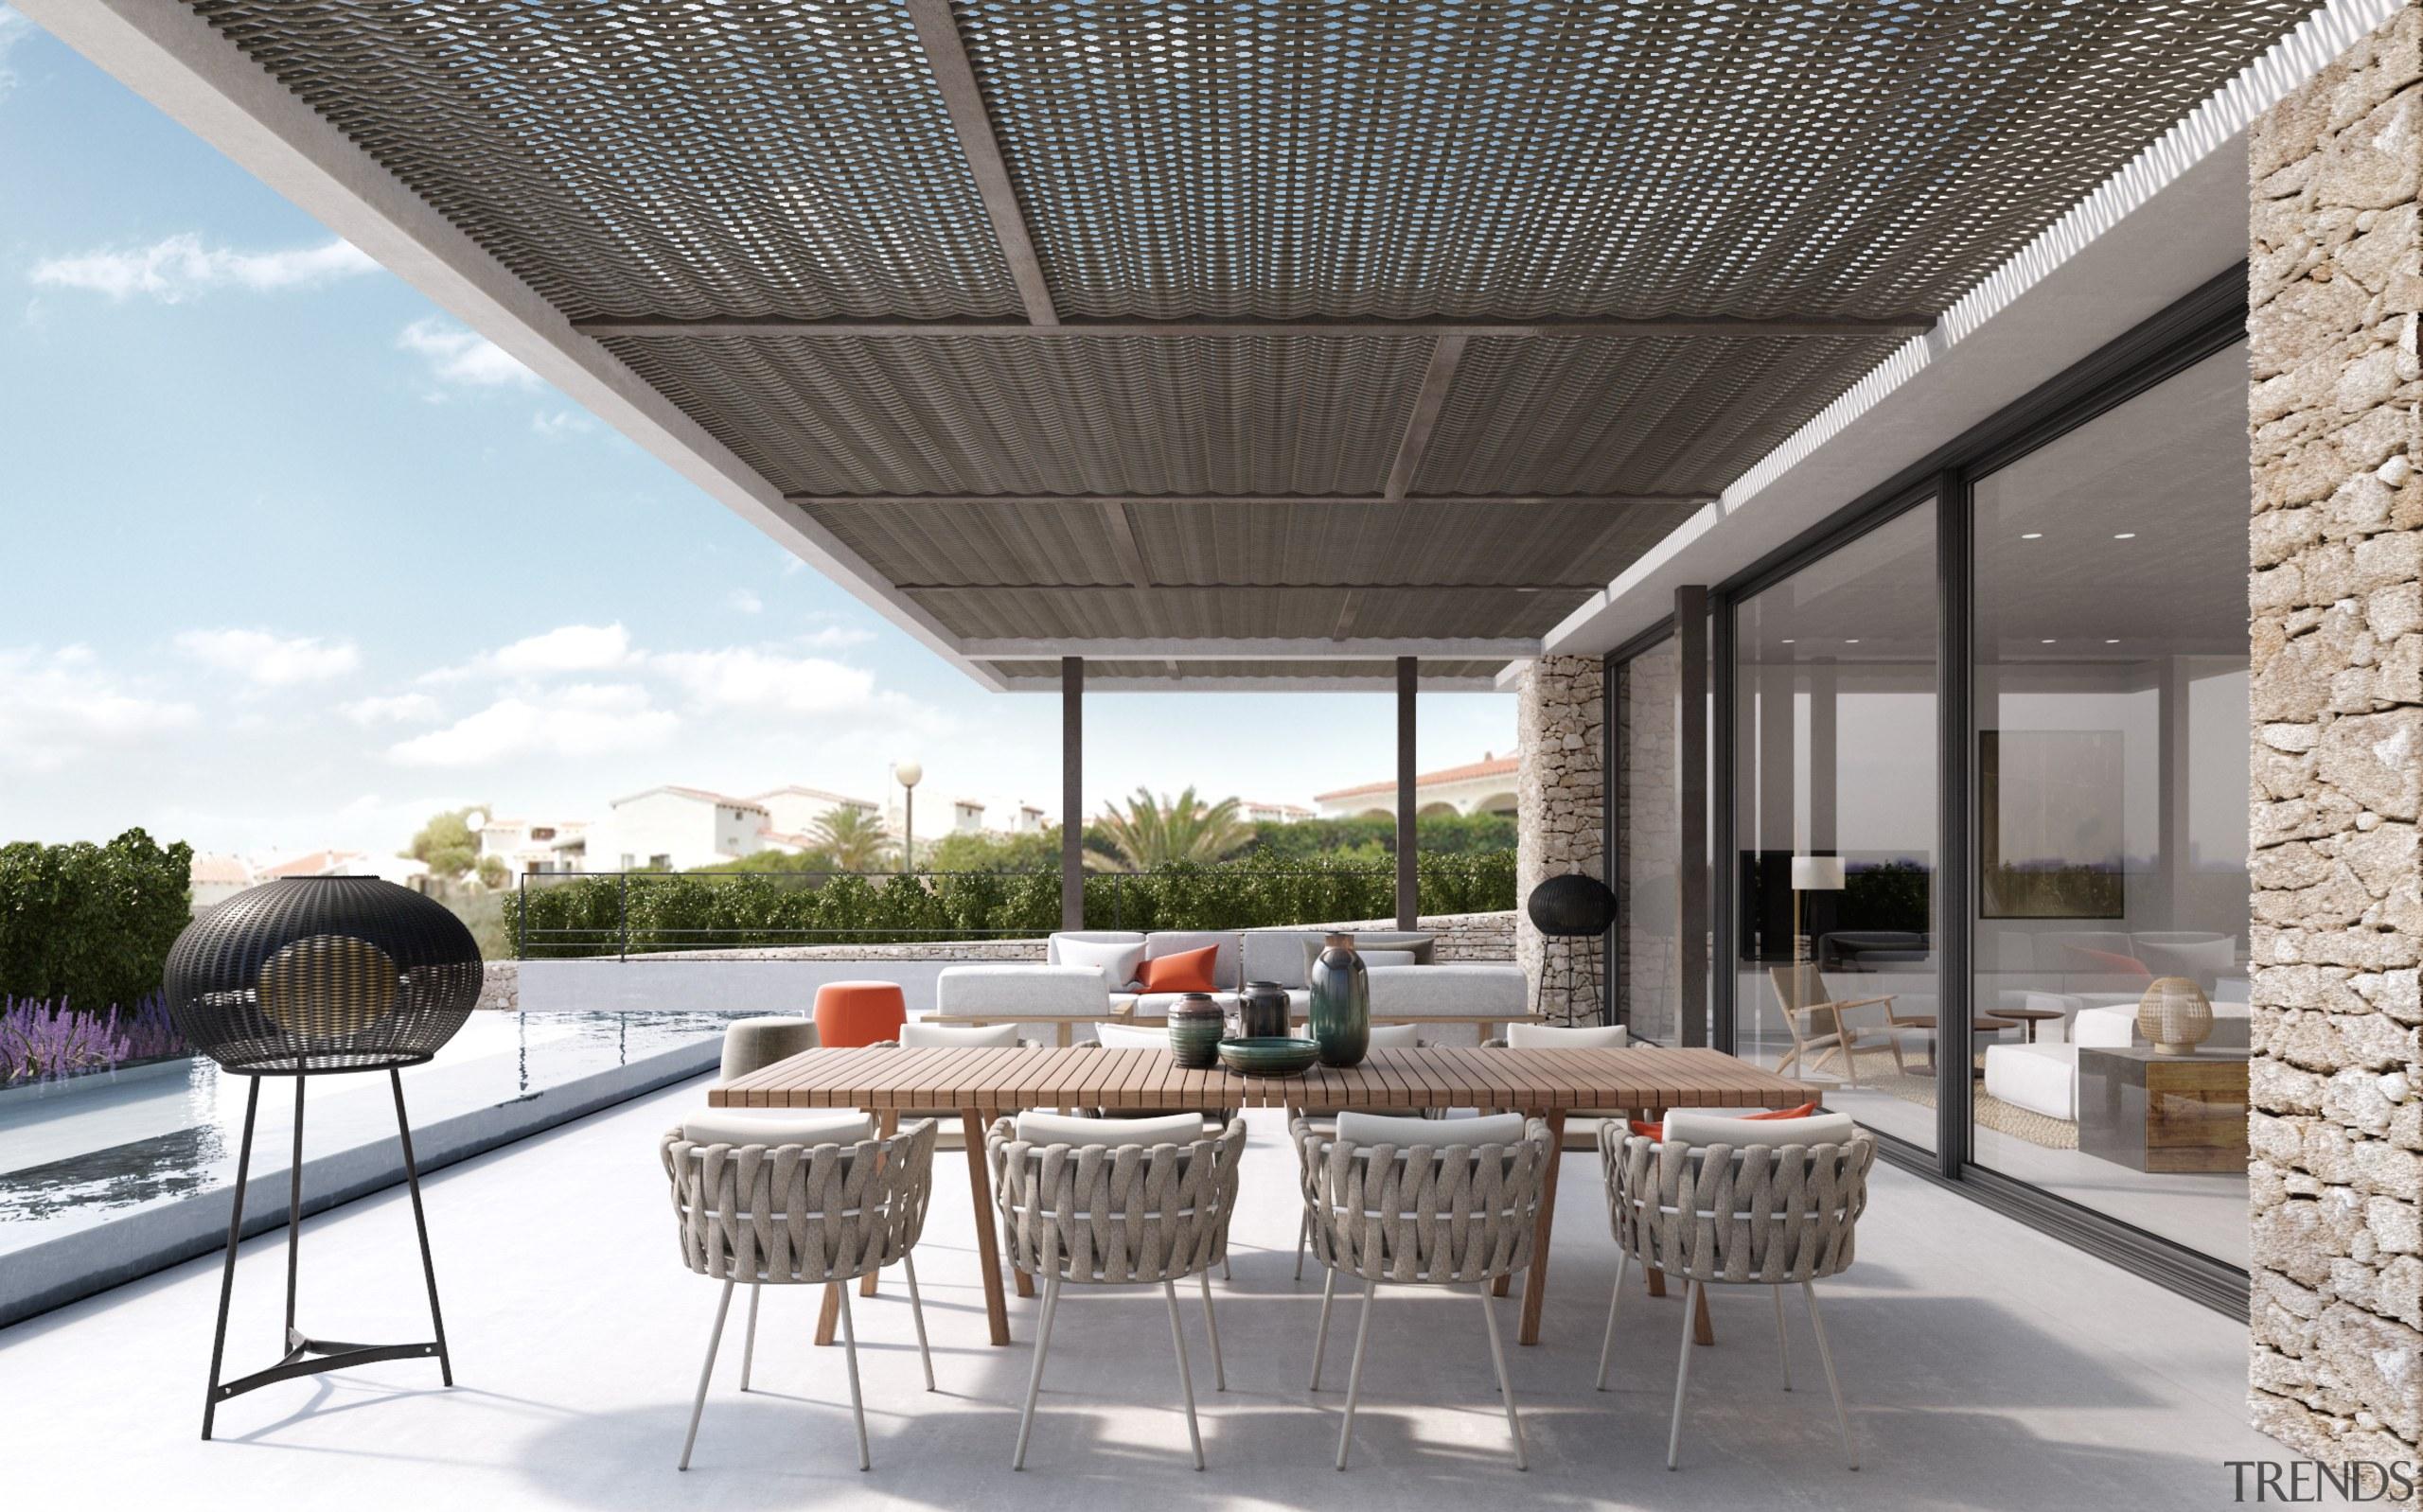 Island life – Terrace - house | interior house, interior design, patio, real estate, roof, white, gray